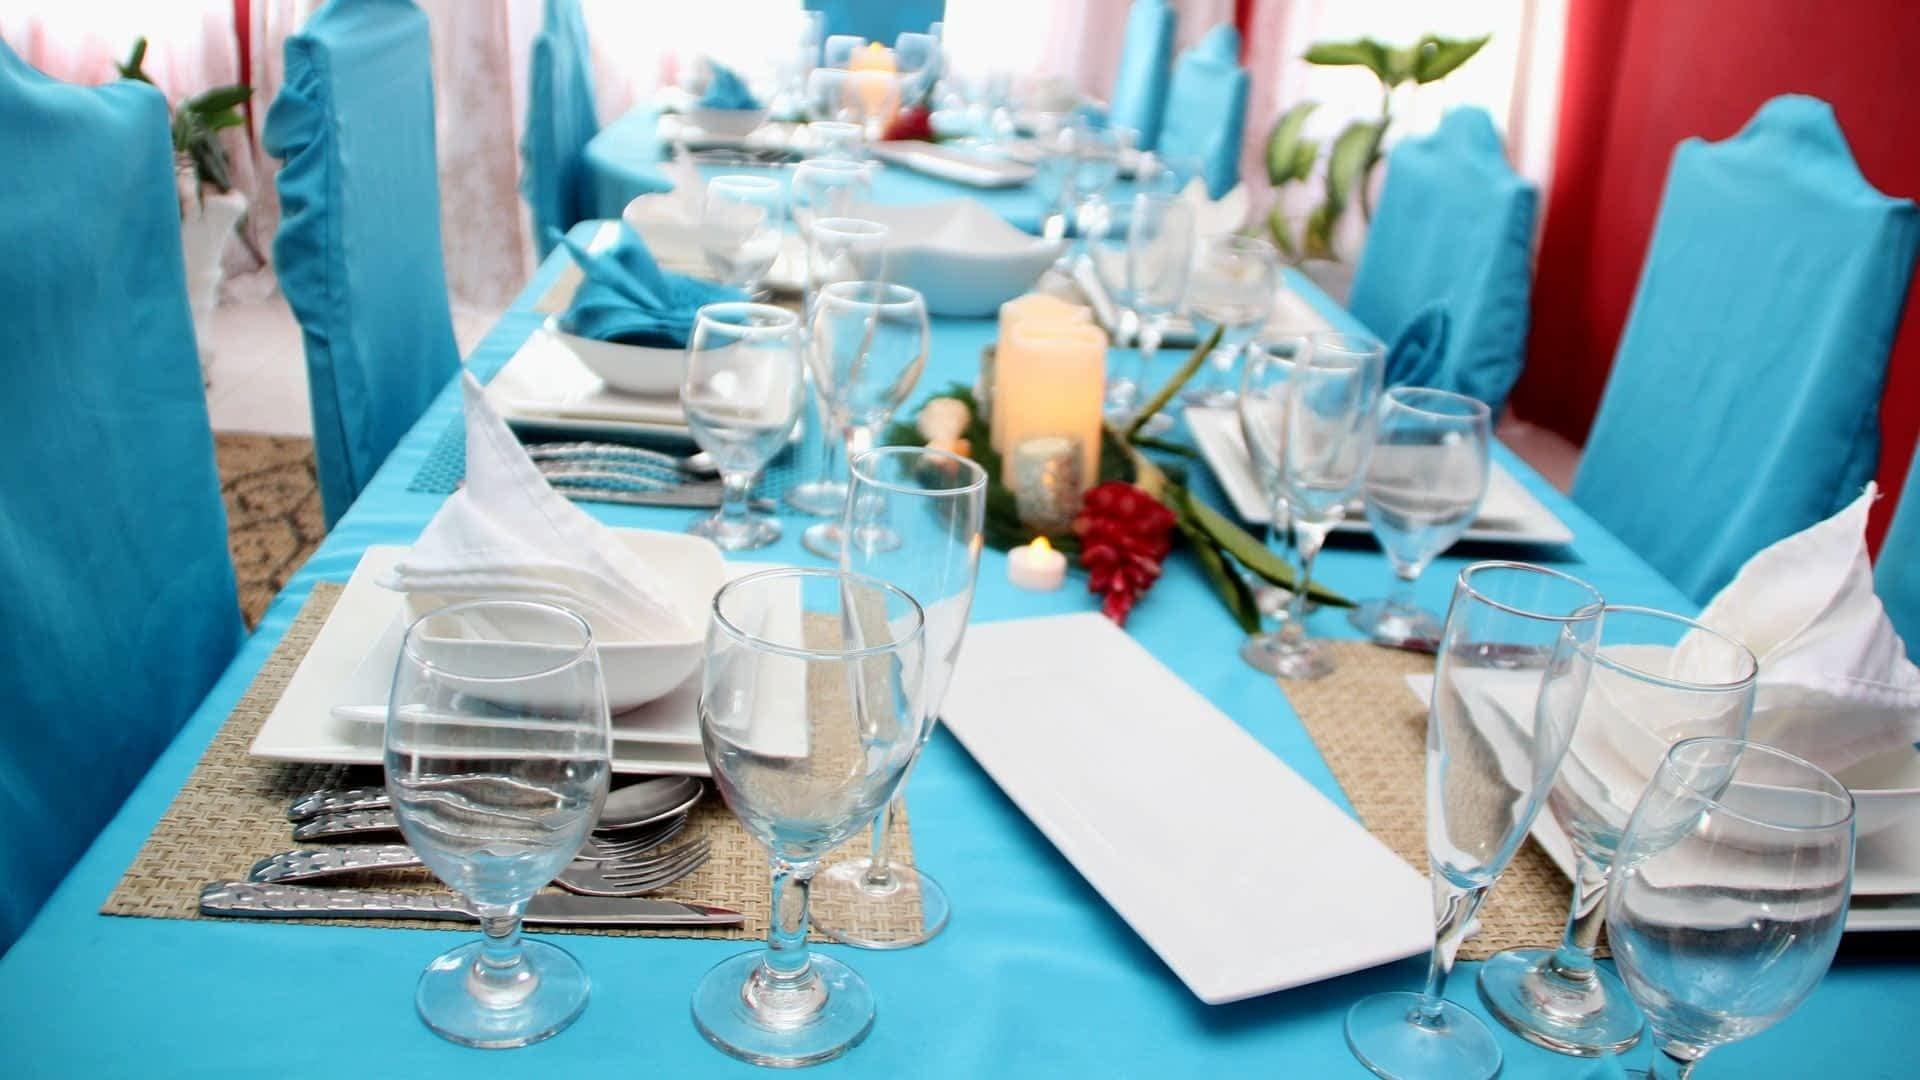 Villas in Jamaica dining experience